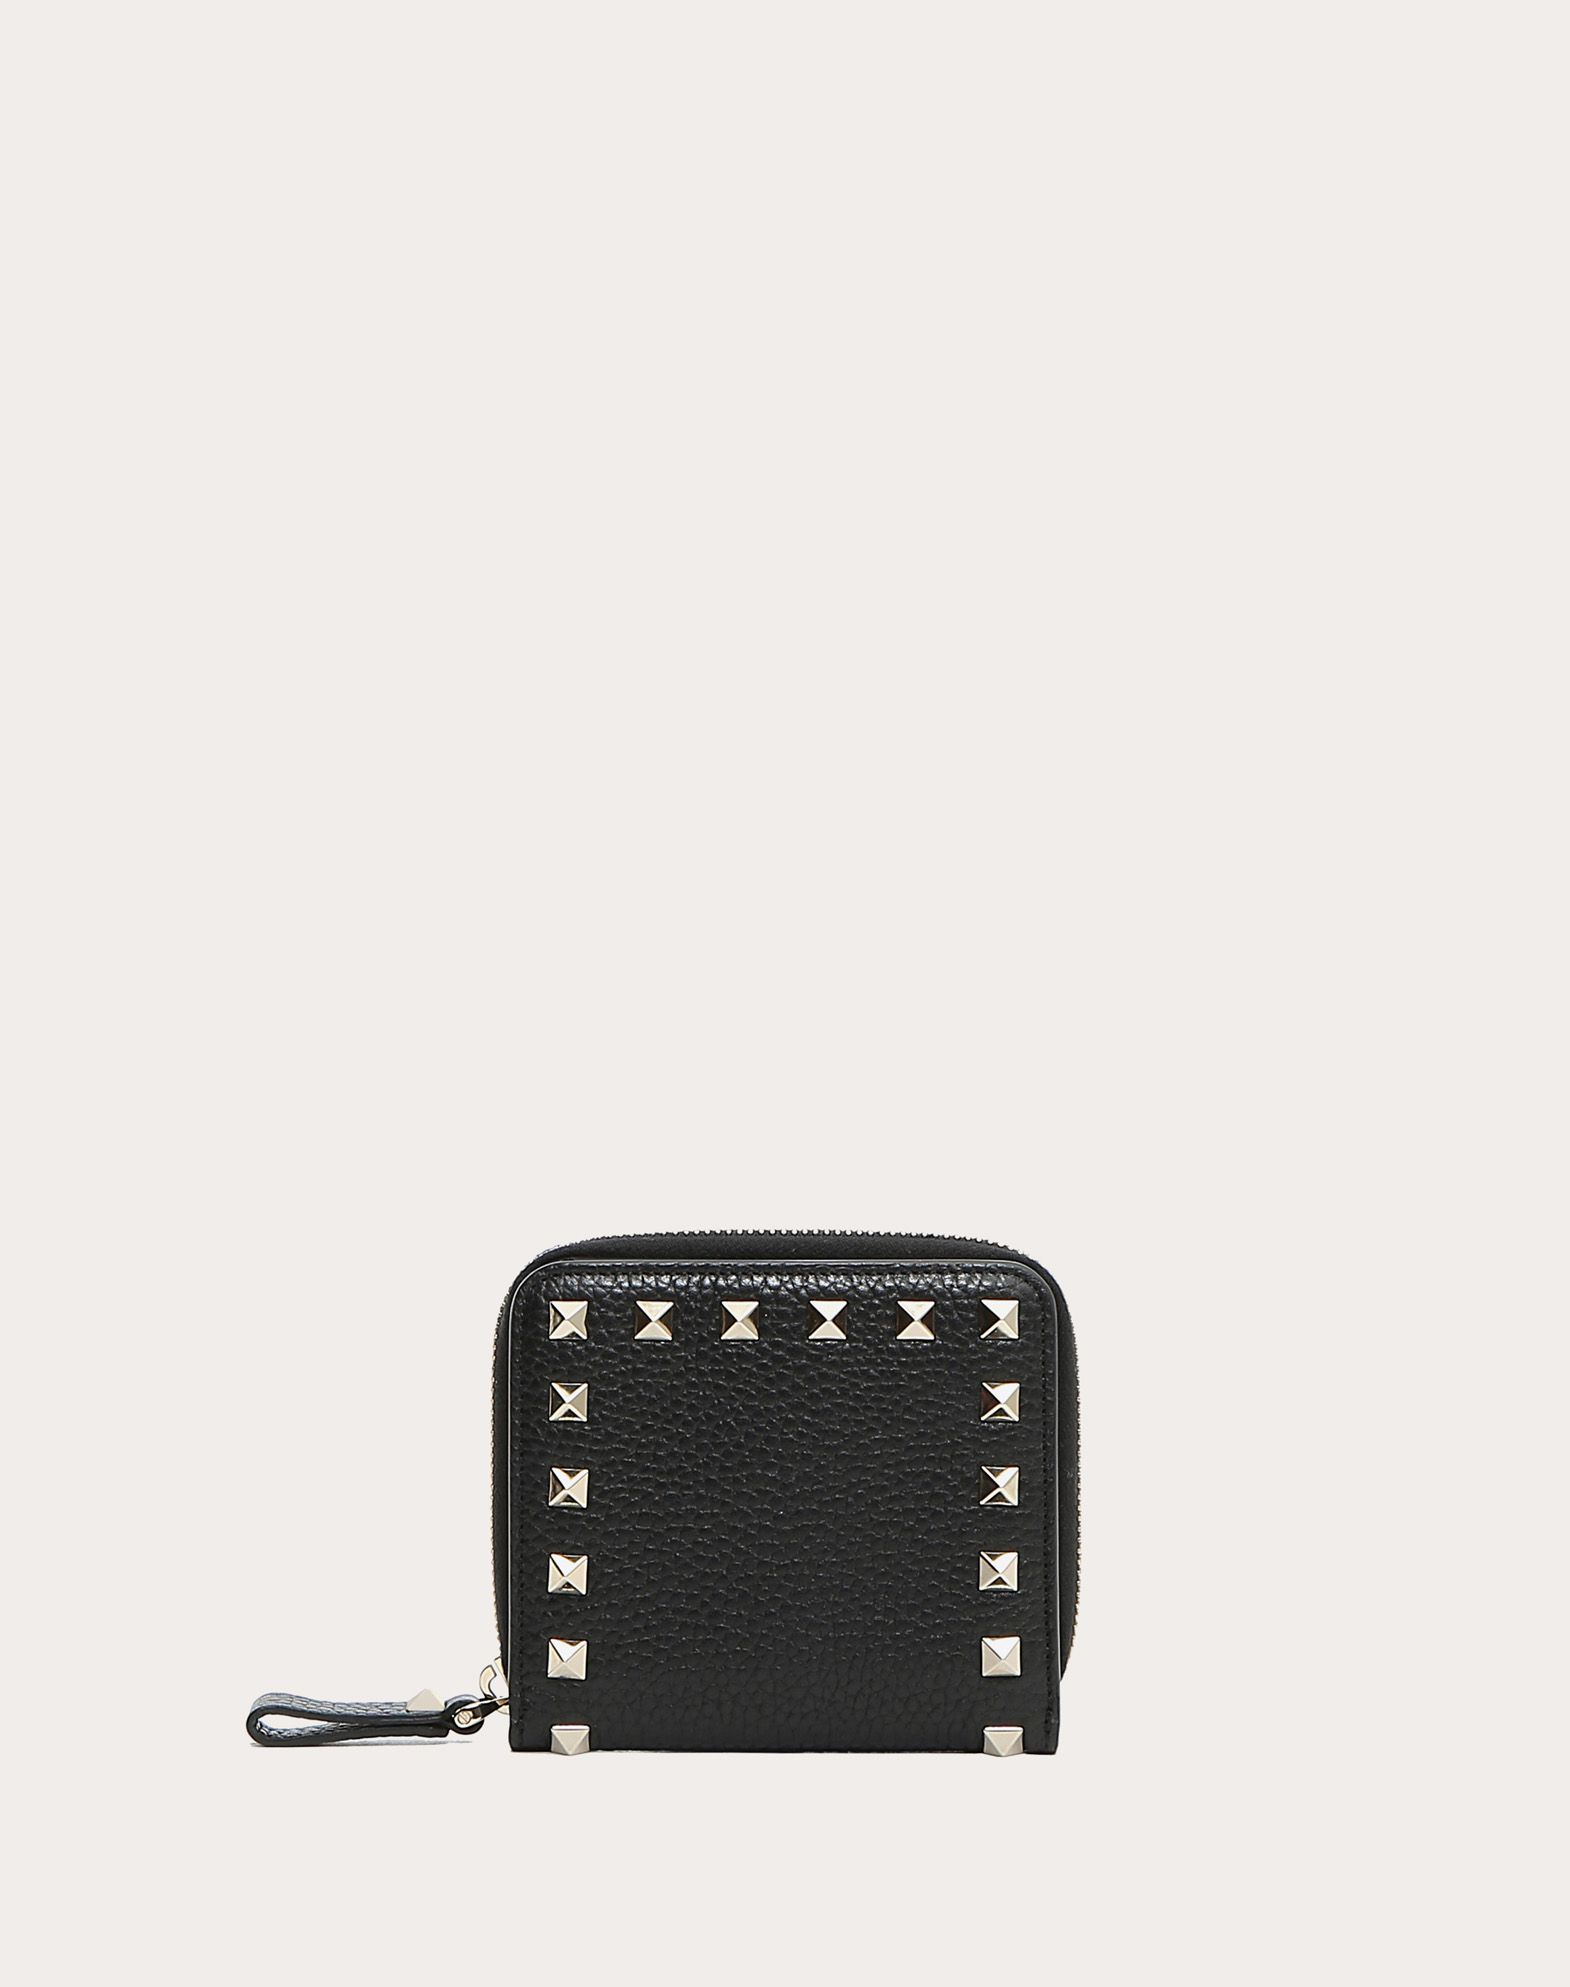 VALENTINO Textured leather Studs Zip External pocket Internal card slots  46535933ew